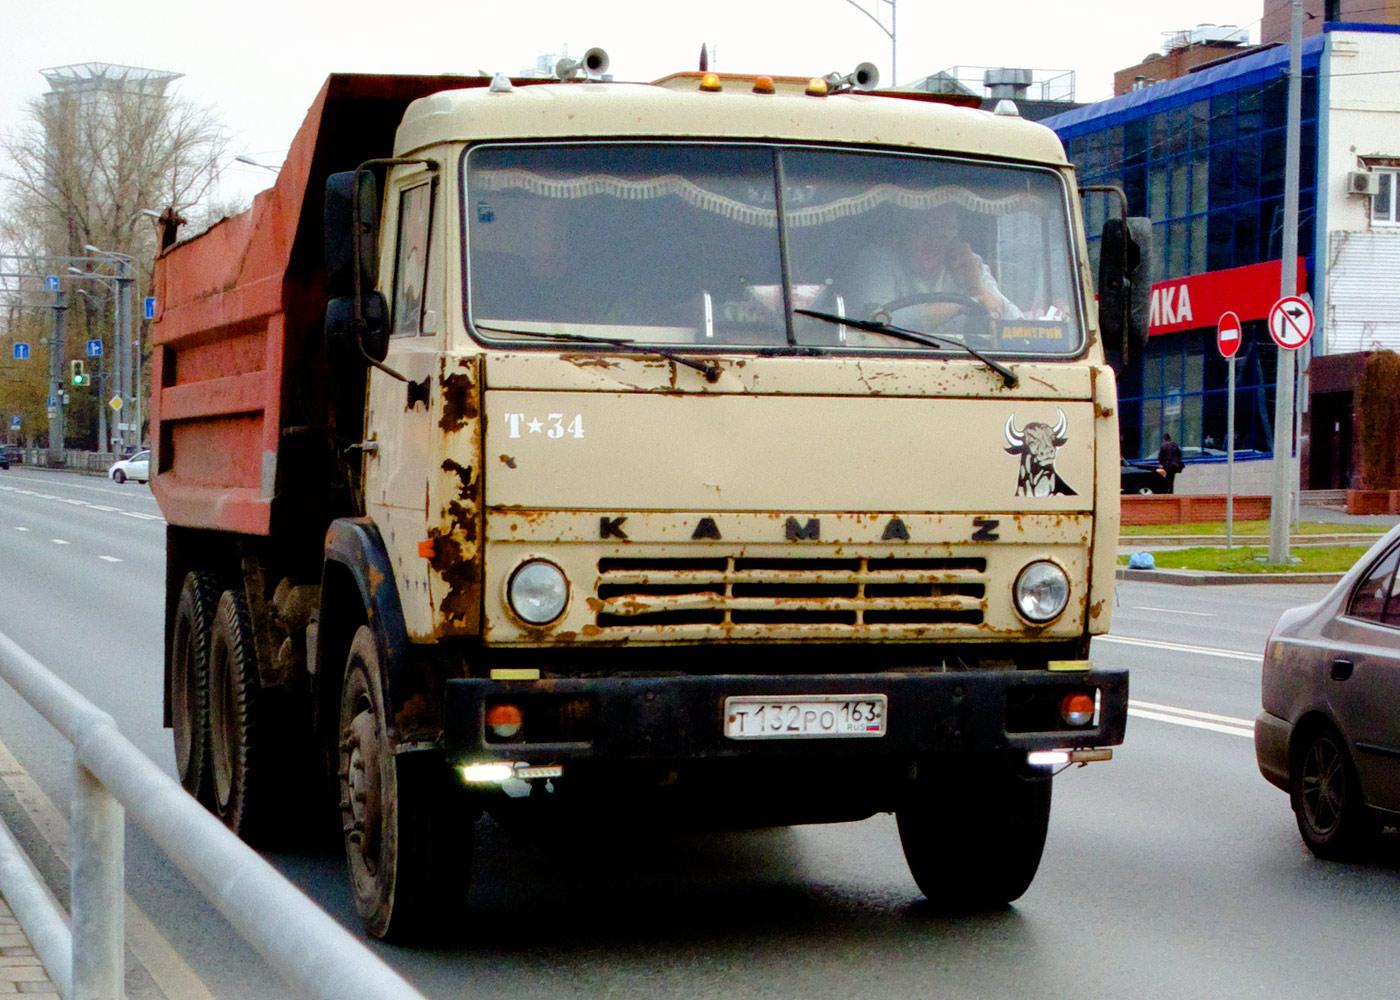 КамАЗ-55111 #Т132РО163. Самара, Московское шоссе